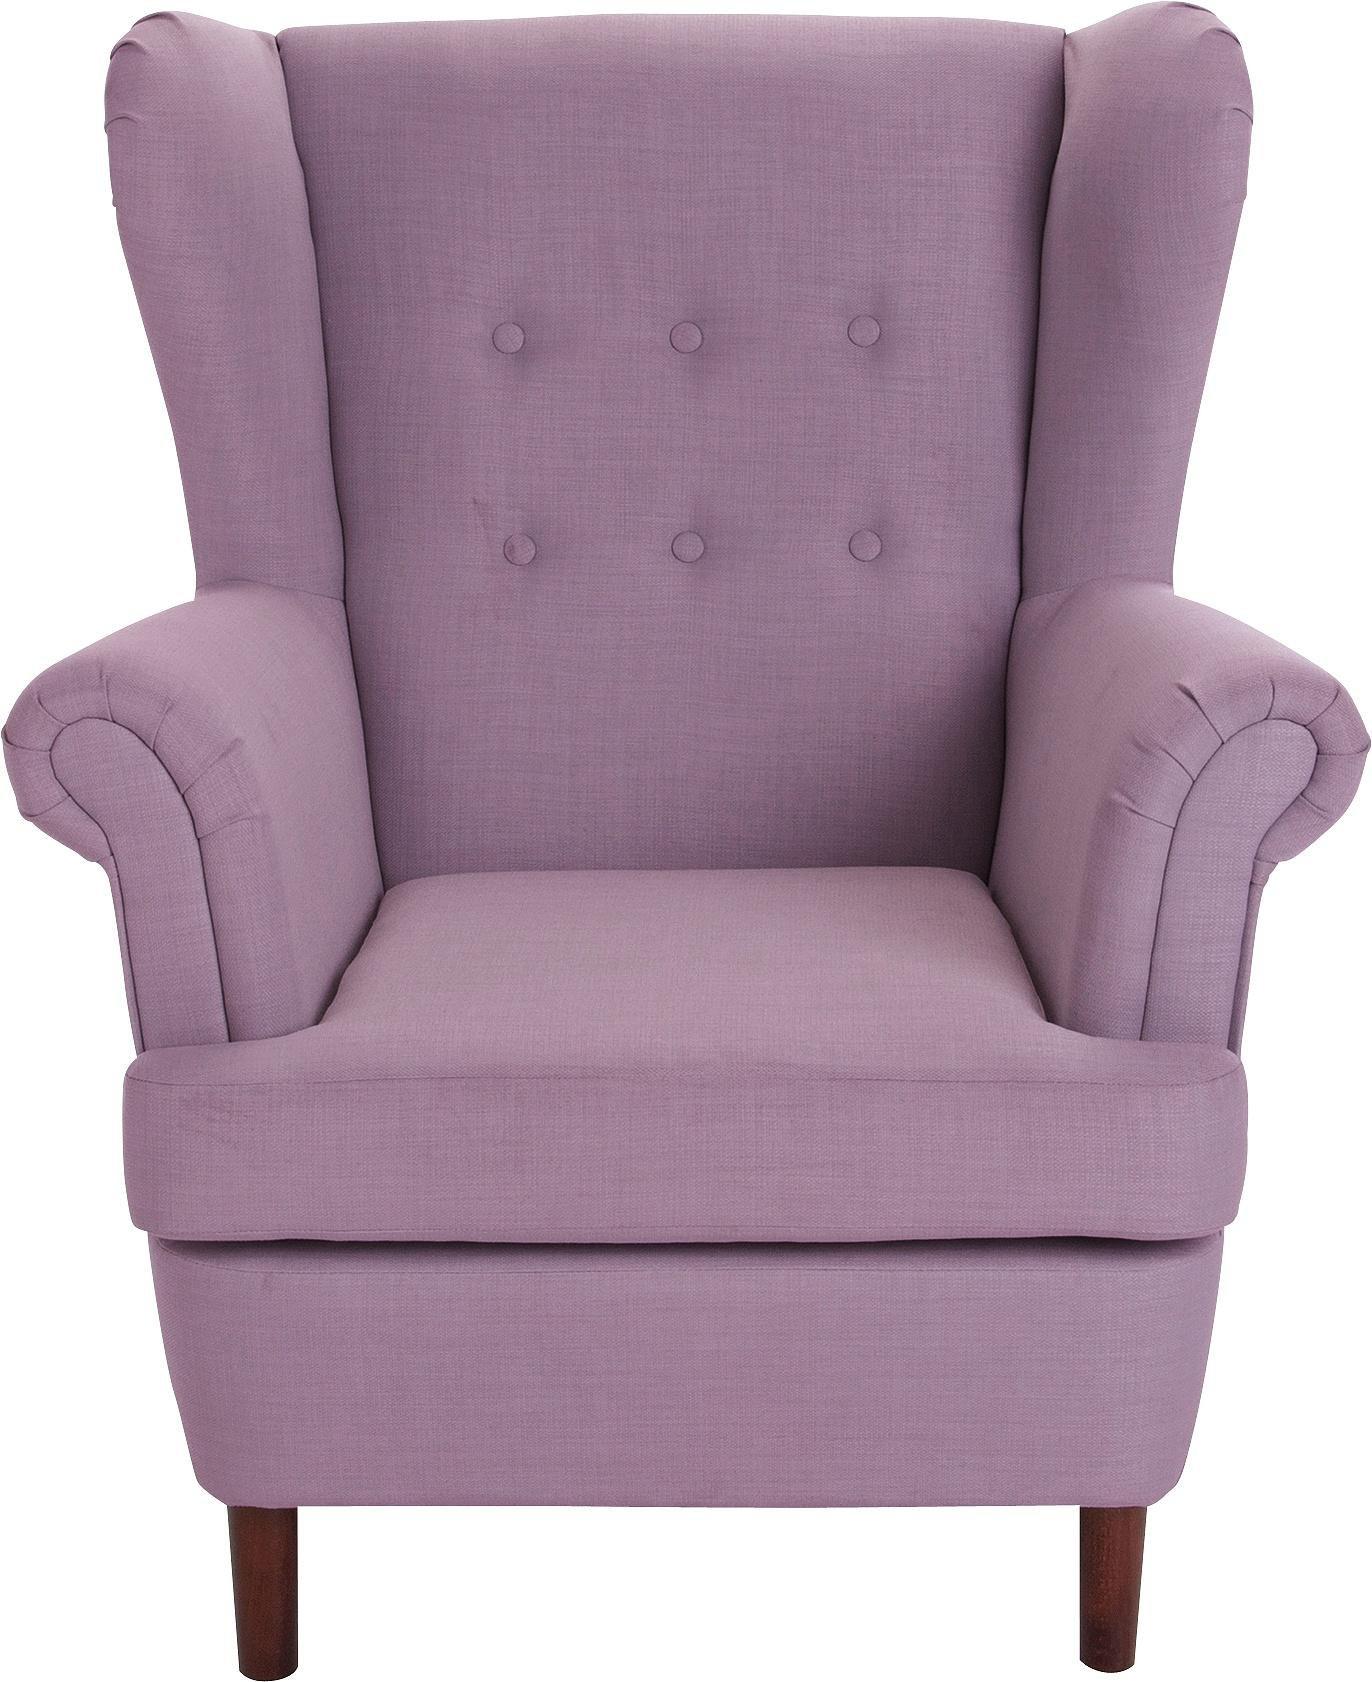 Argos Home Martha Fabric Wingback Chair - Lilac